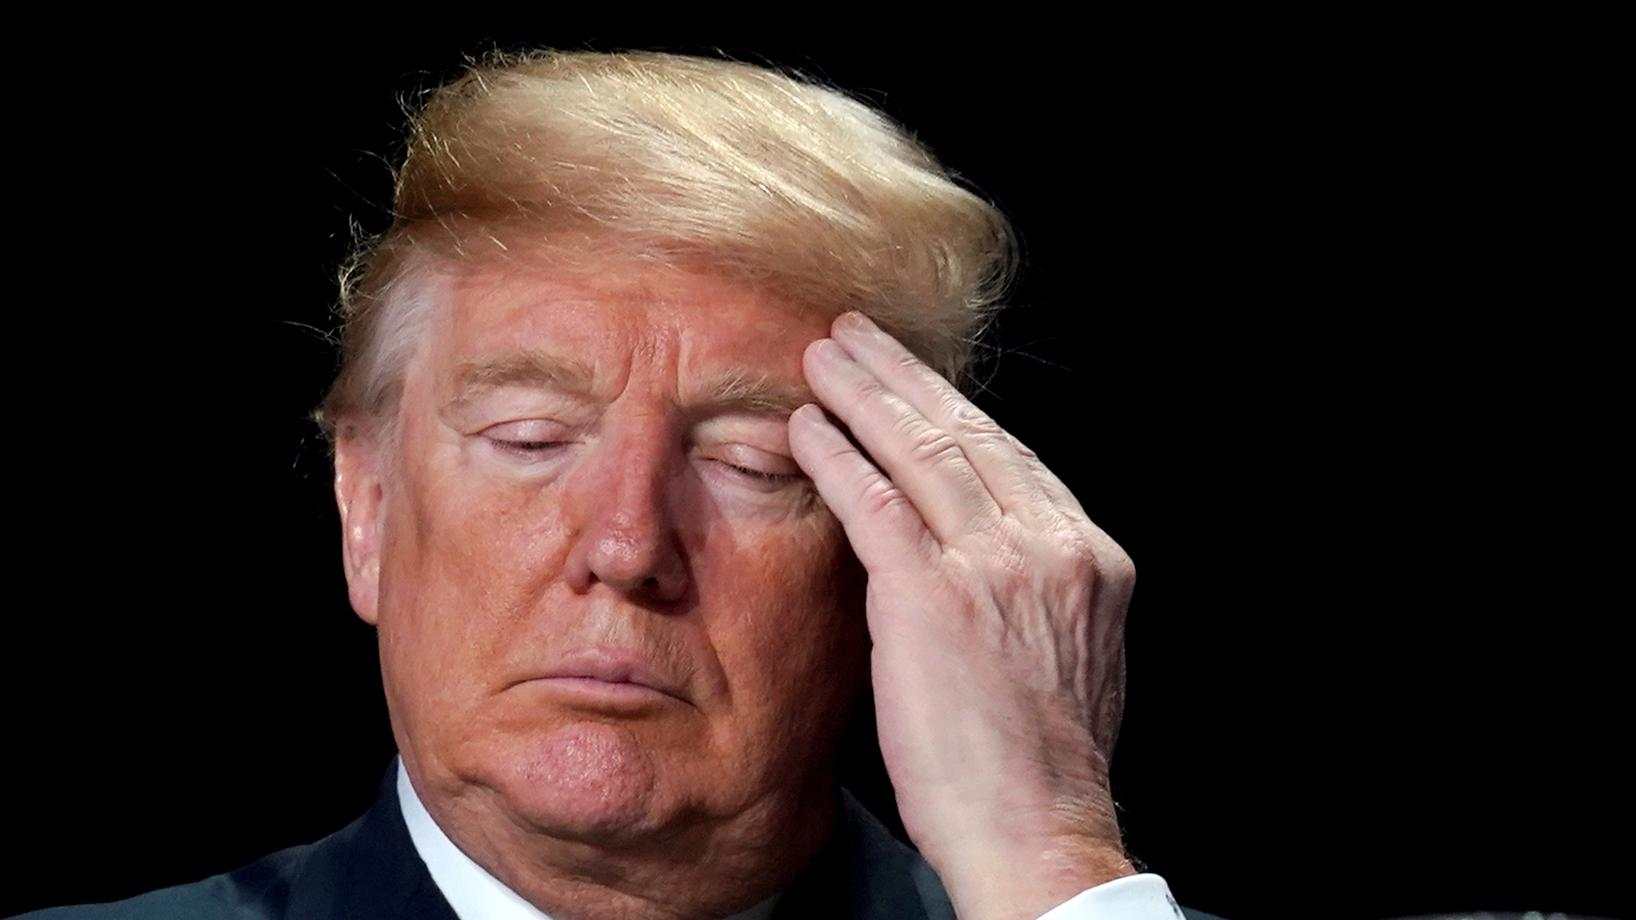 Trump Akan Tentukan Sikap AS soal Kesepakatan Nuklir Iran